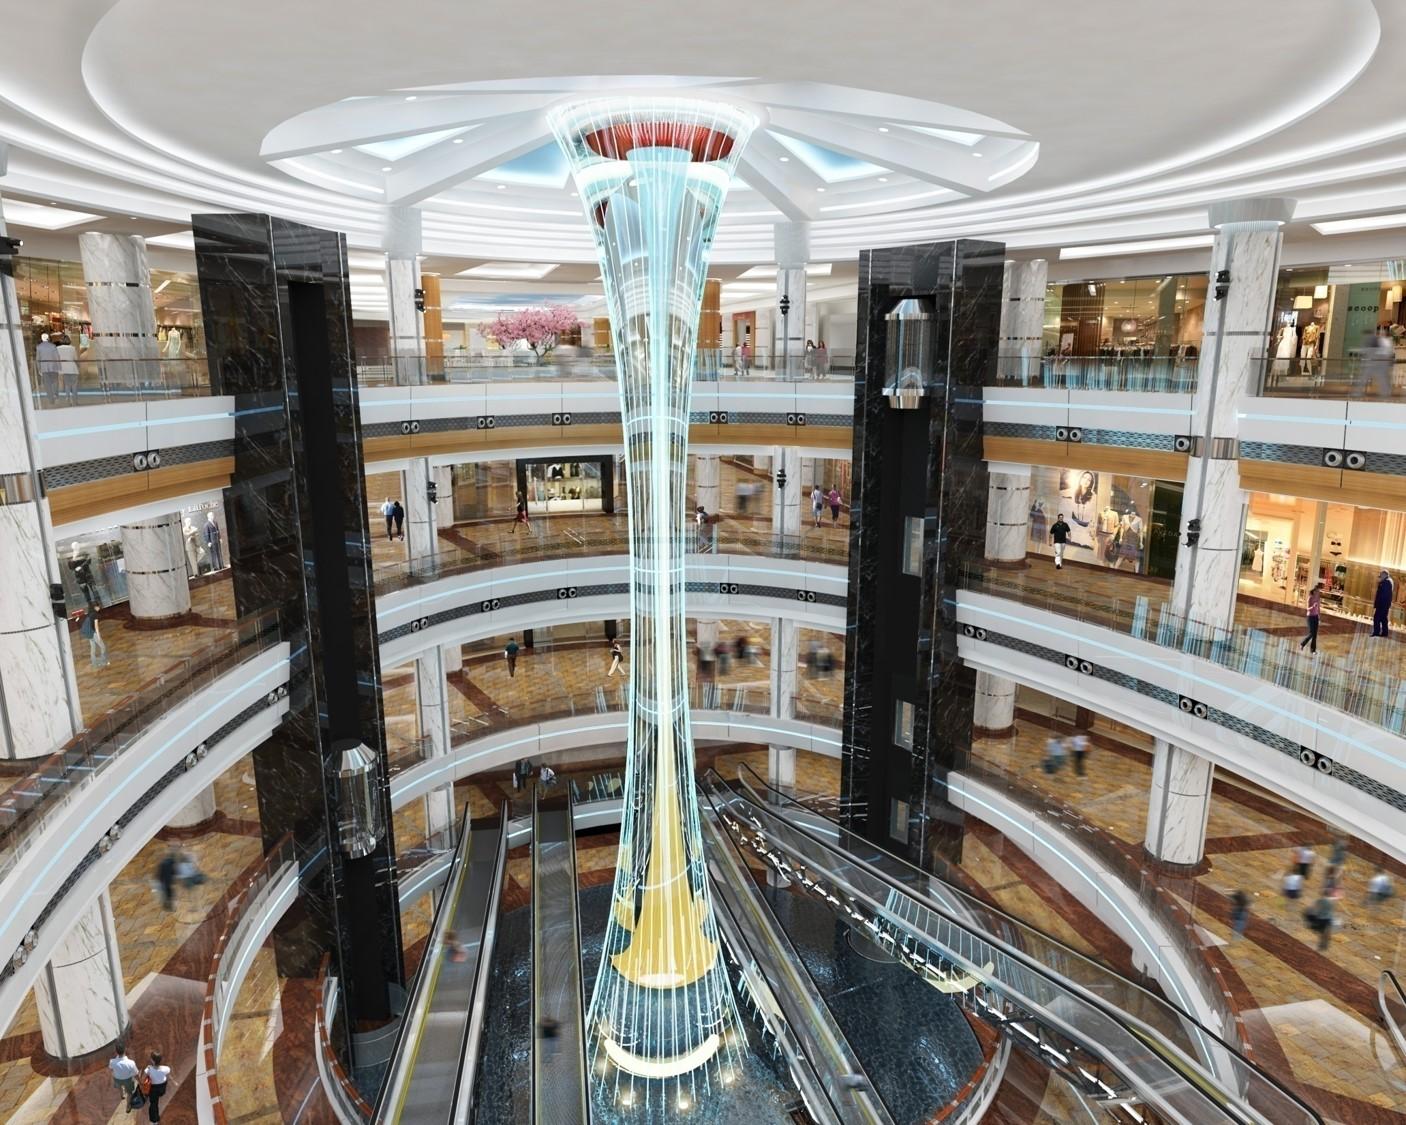 charles_tang_design_sahara_shopping_mall_dubai_uae 3